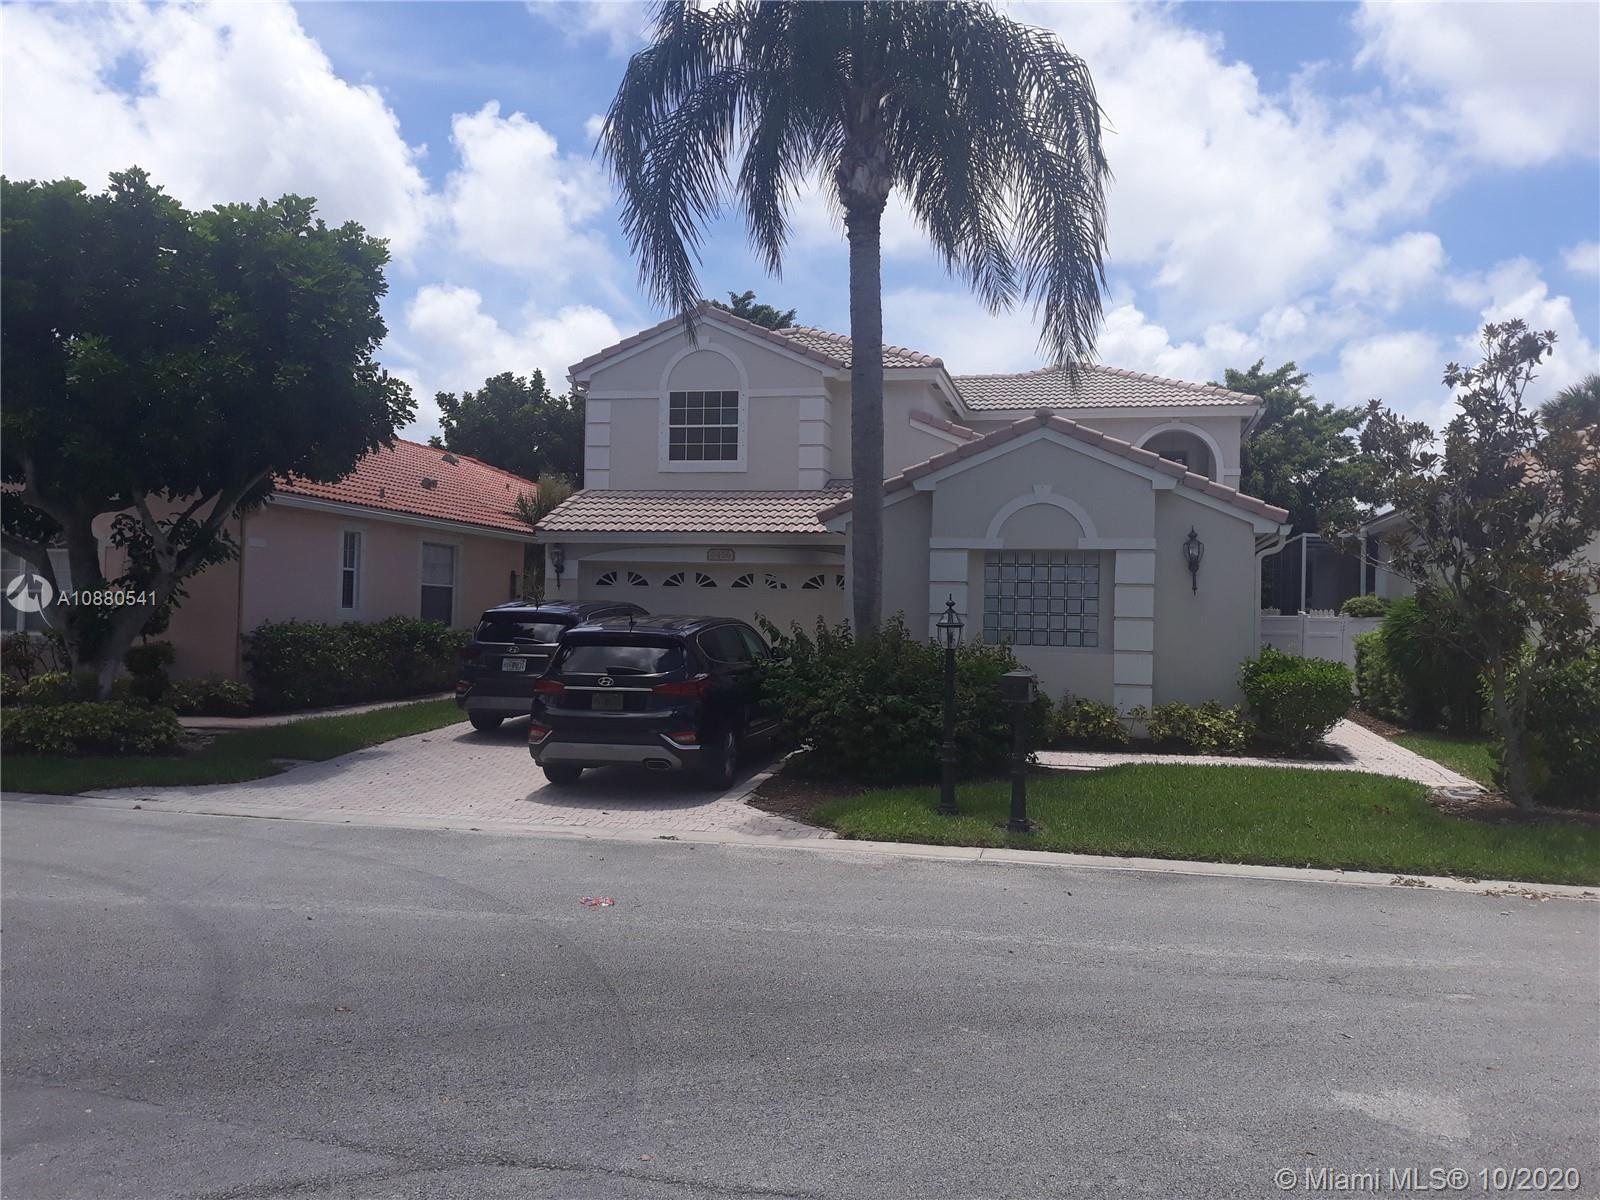 6466 E Brava Way, Boca Raton, FL 33433 - #: A10880541